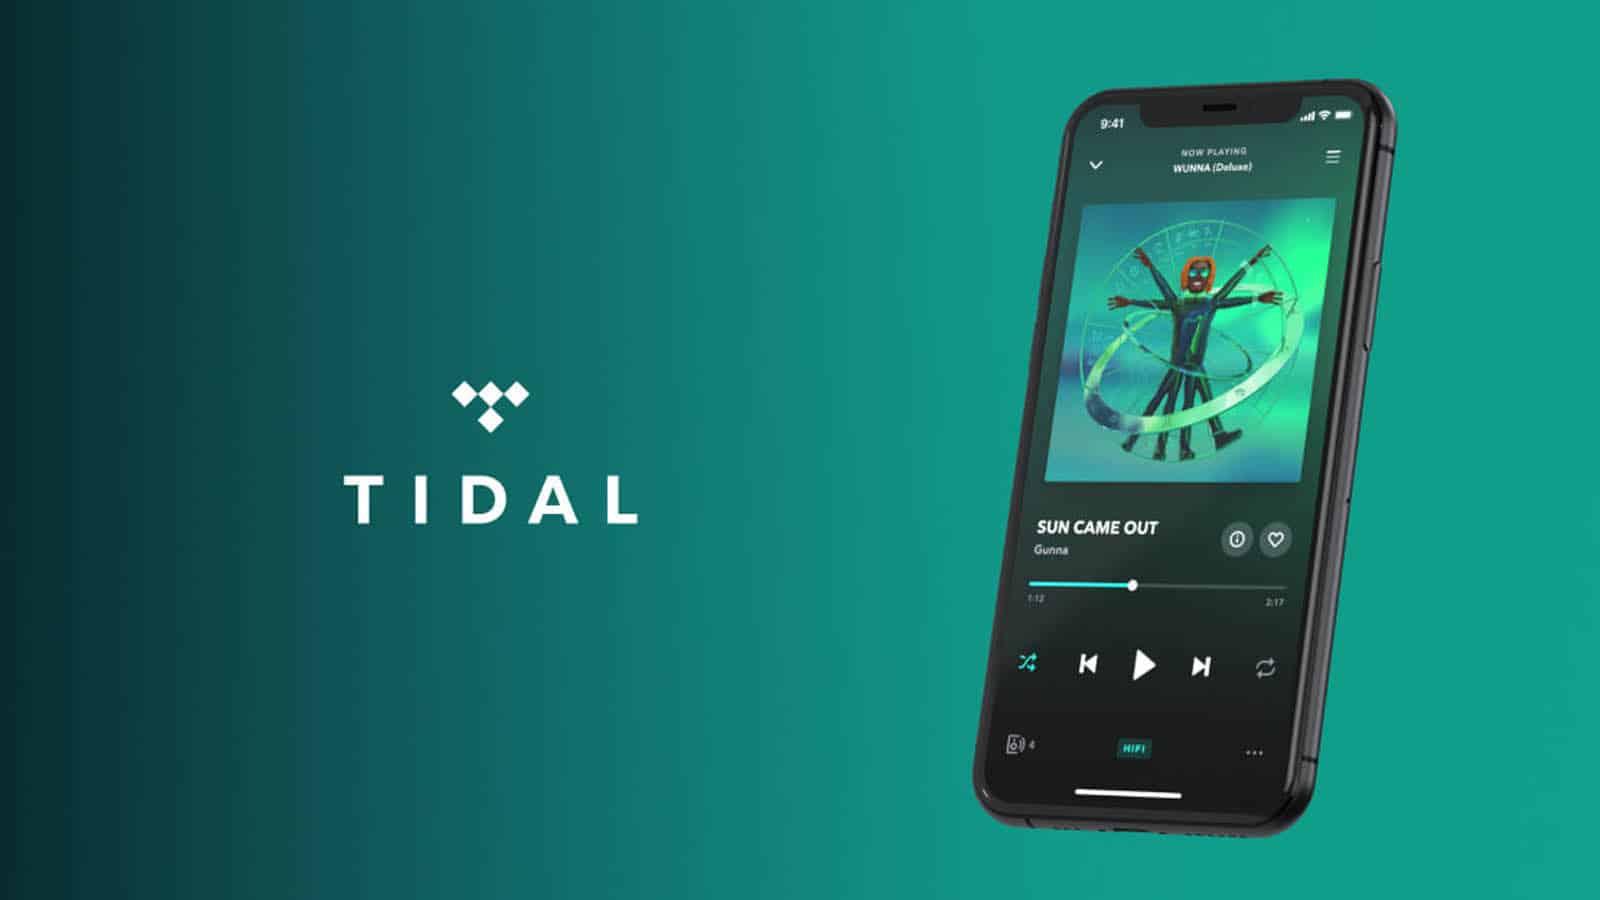 tidal music streaming